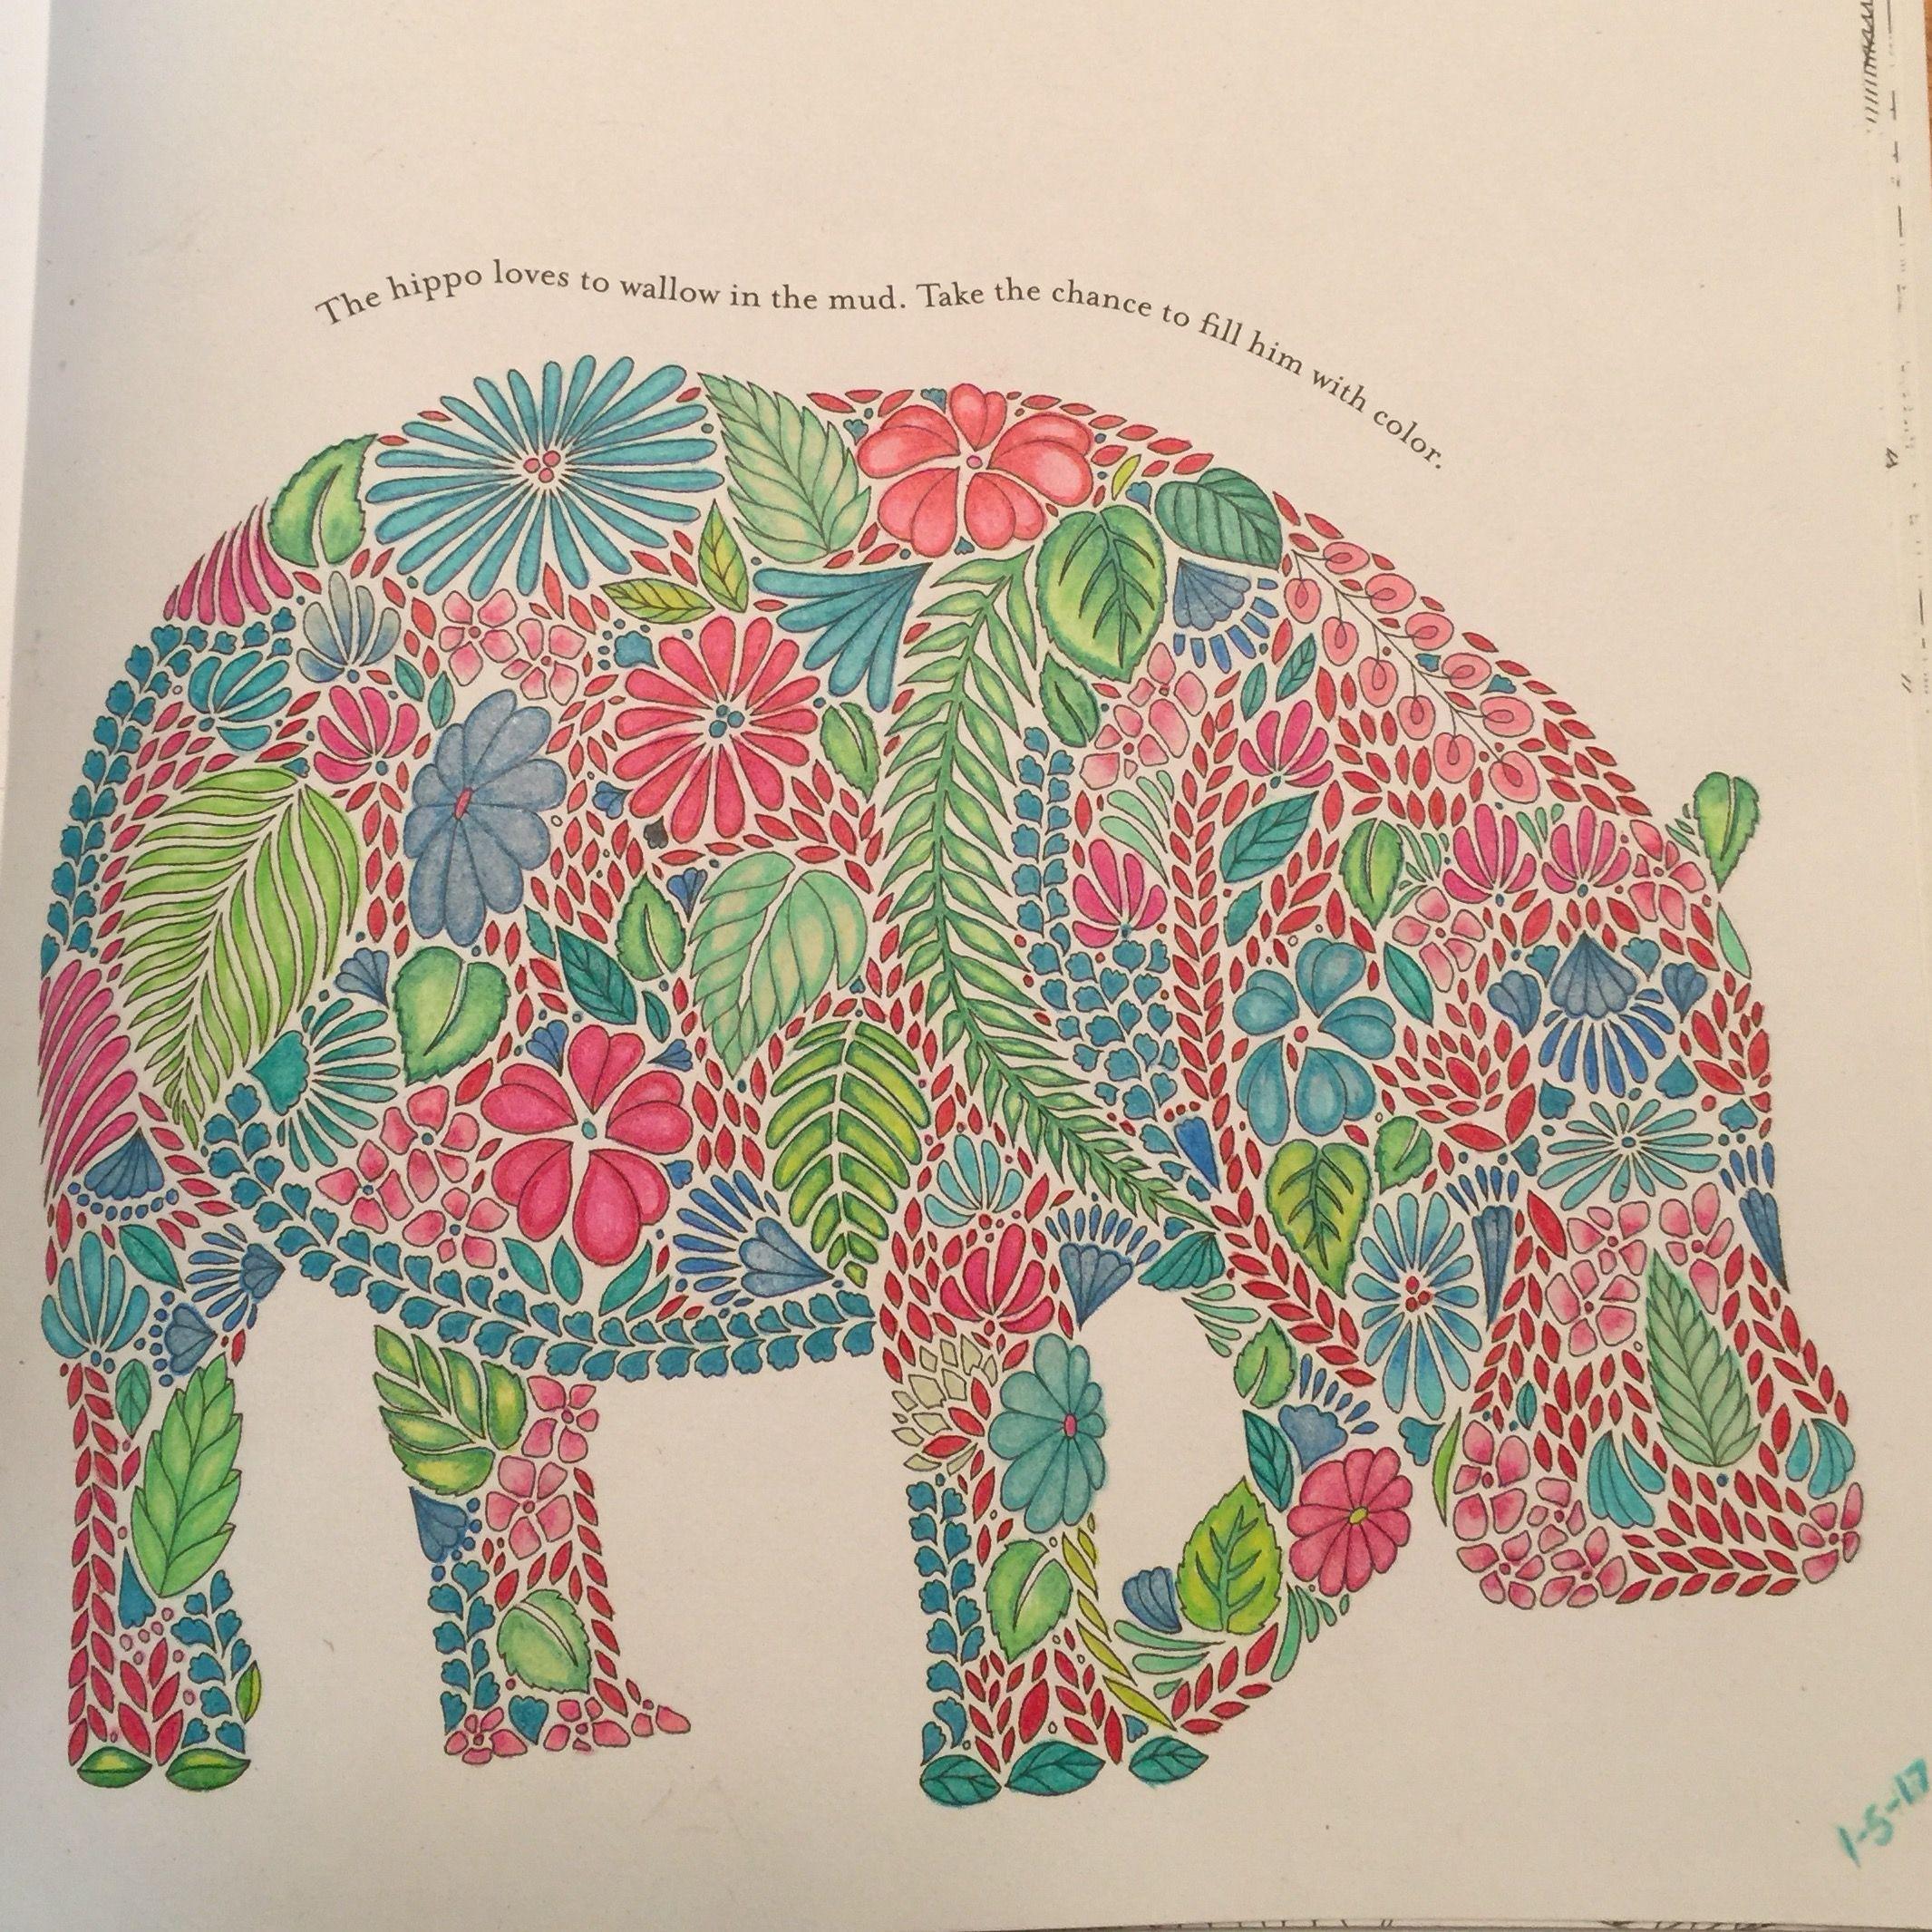 Hippo From Millie Marotta S Animal Kingdom Completed 1 5 2017 Millie Marotta Animal Kingdom Millie Marotta Coloring Books